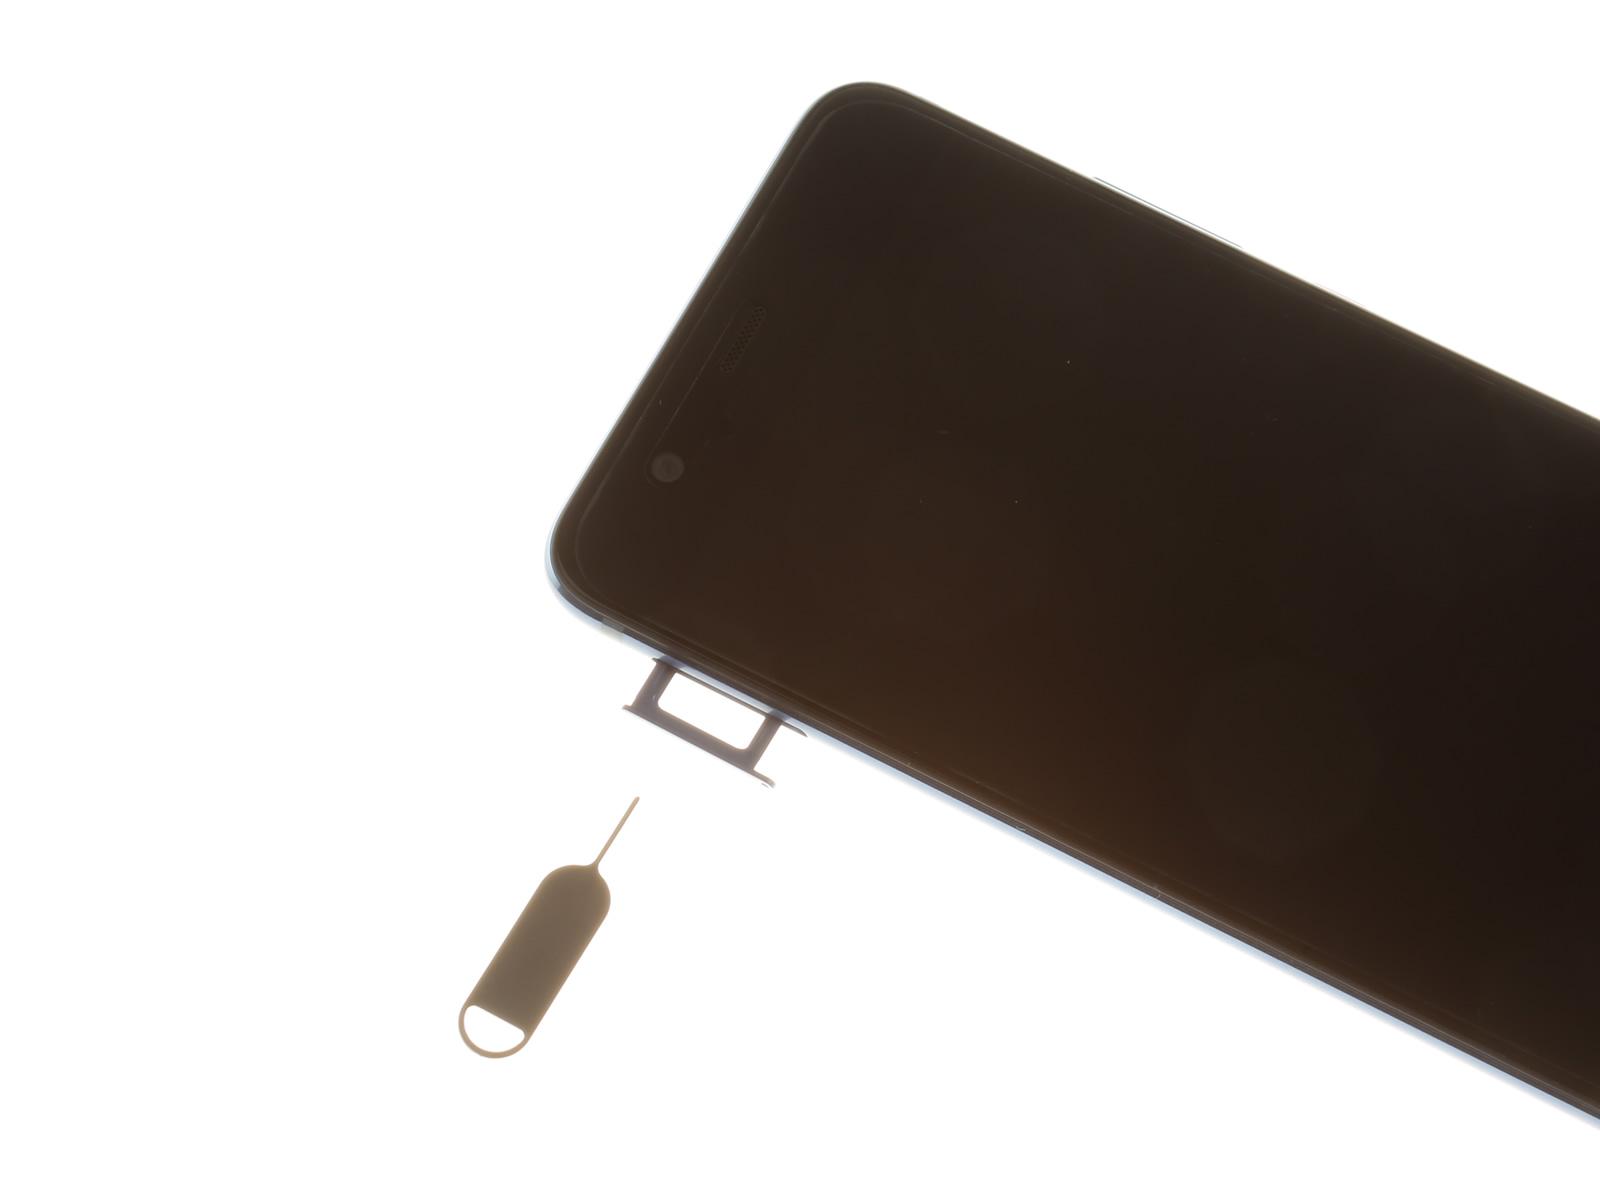 Huawei P10 Sim Karte.Huawei P10 Teardown Myfixguide Com